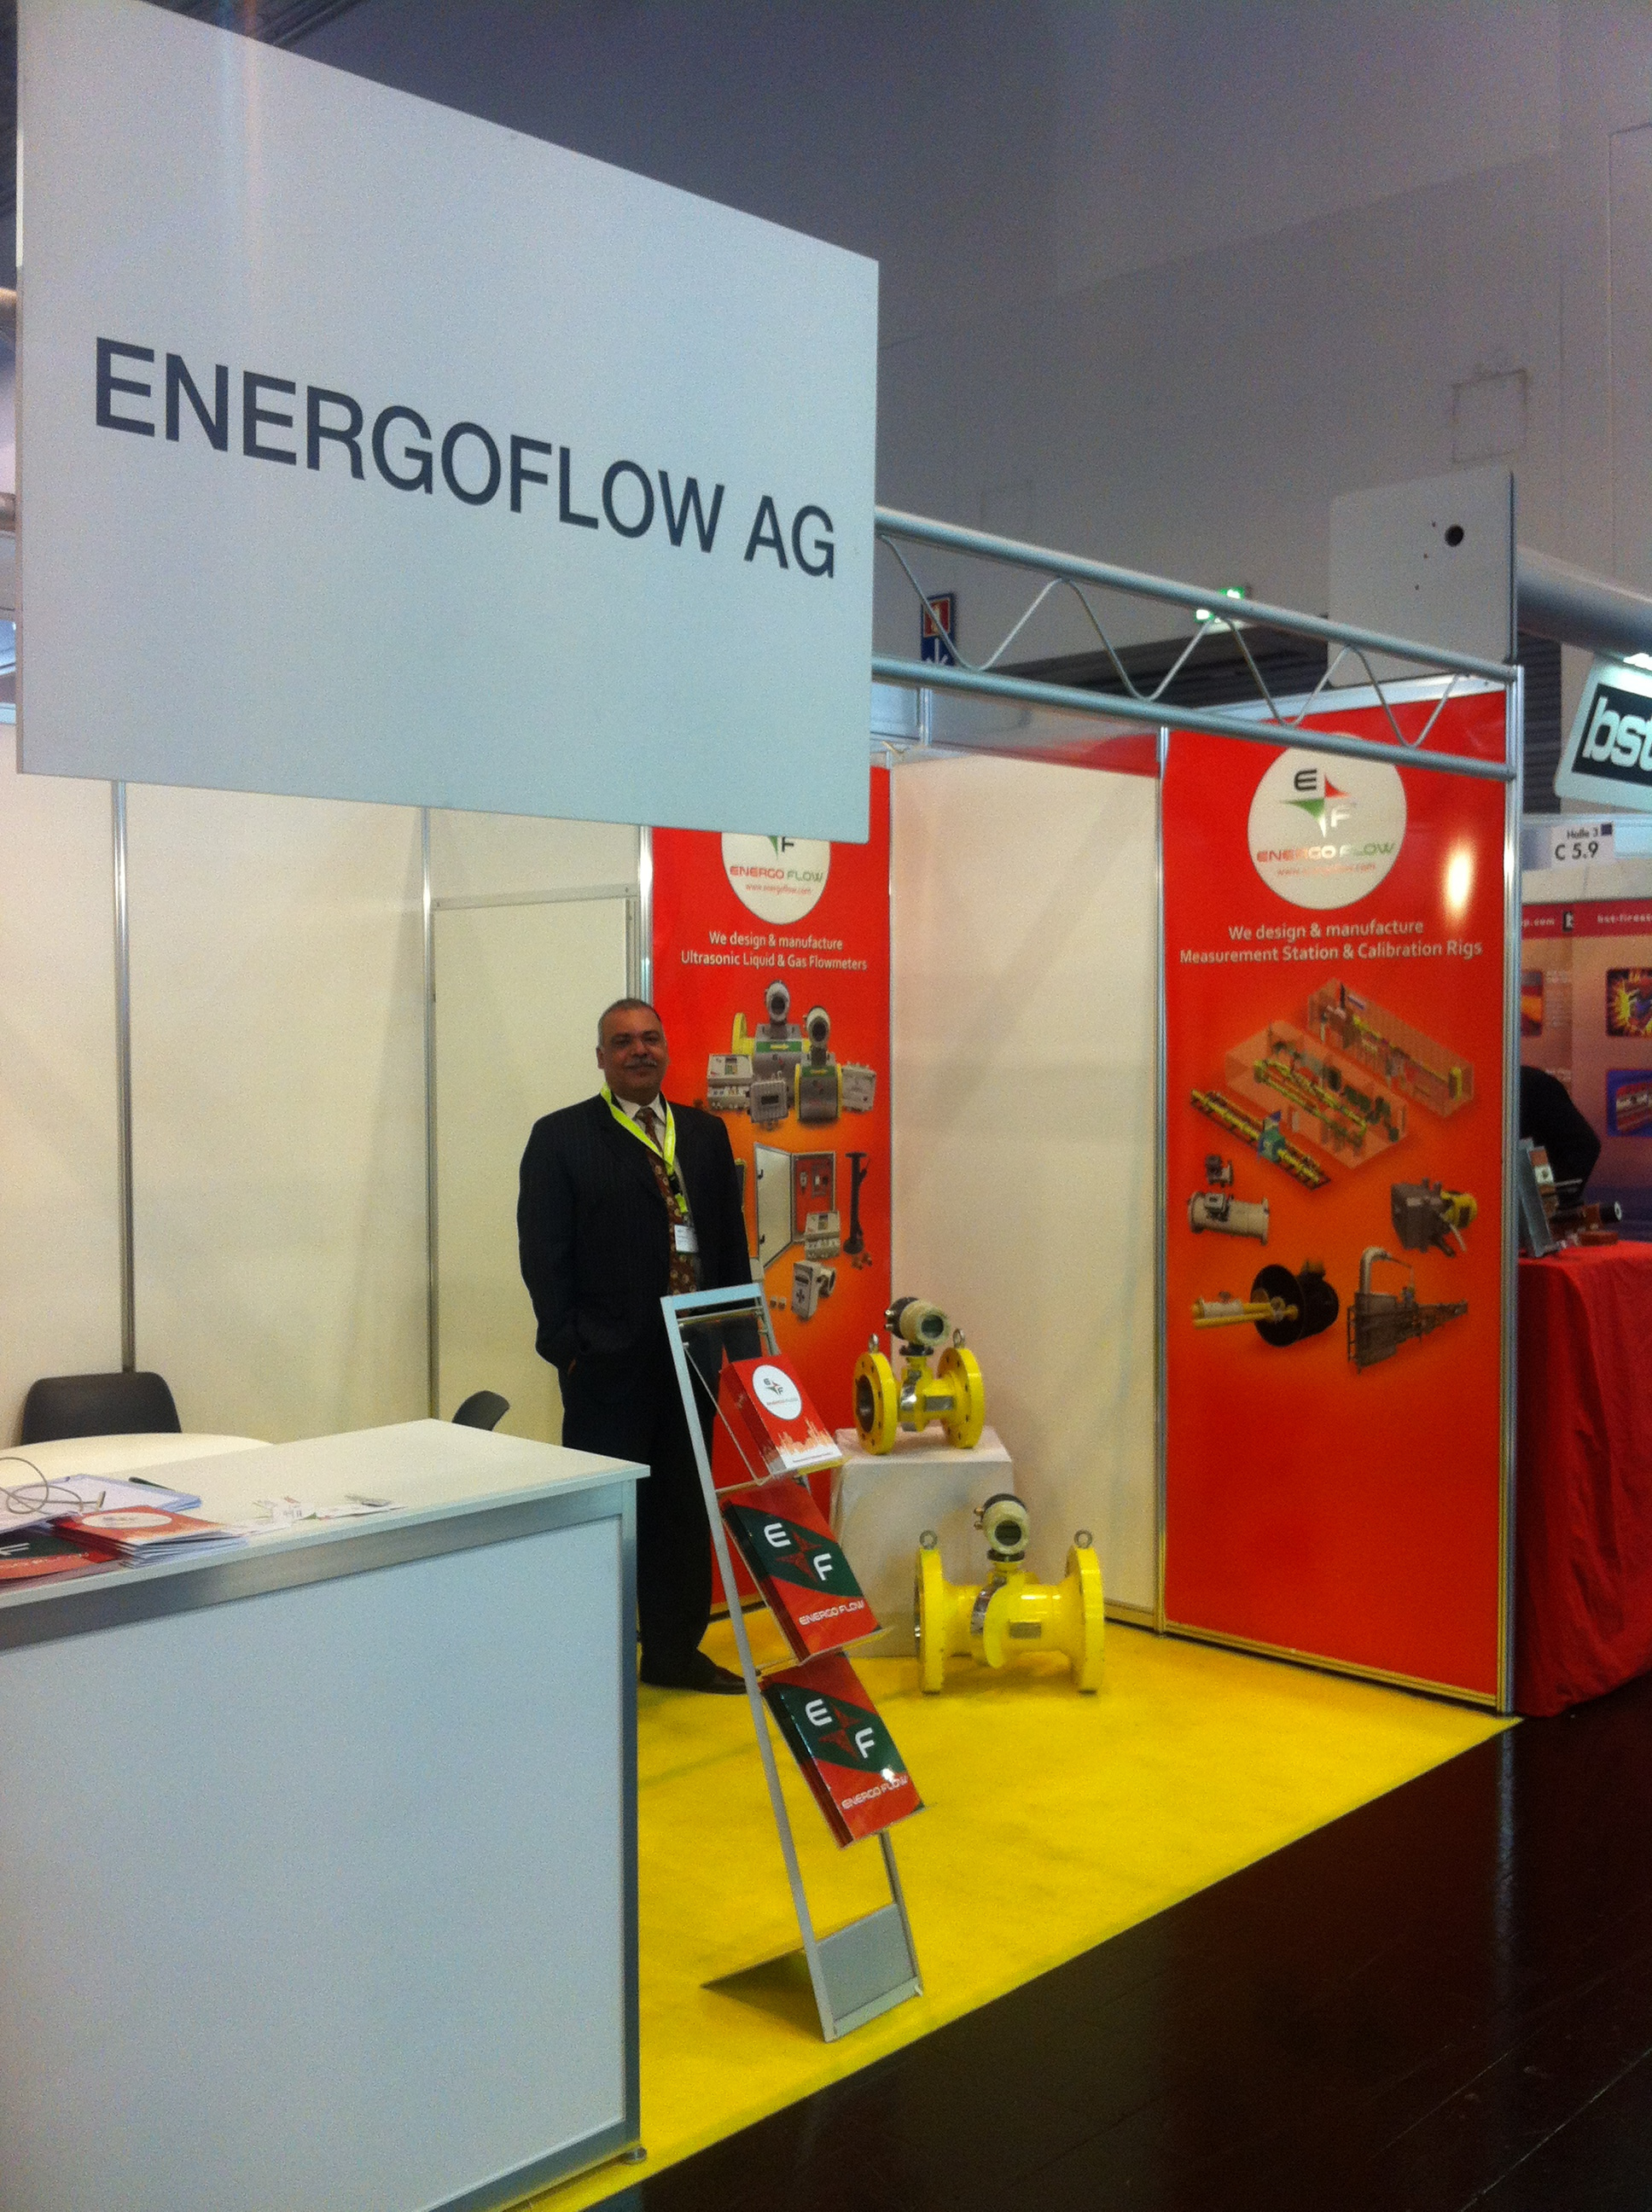 Energoflow AG at GAT 2015 Exhibition